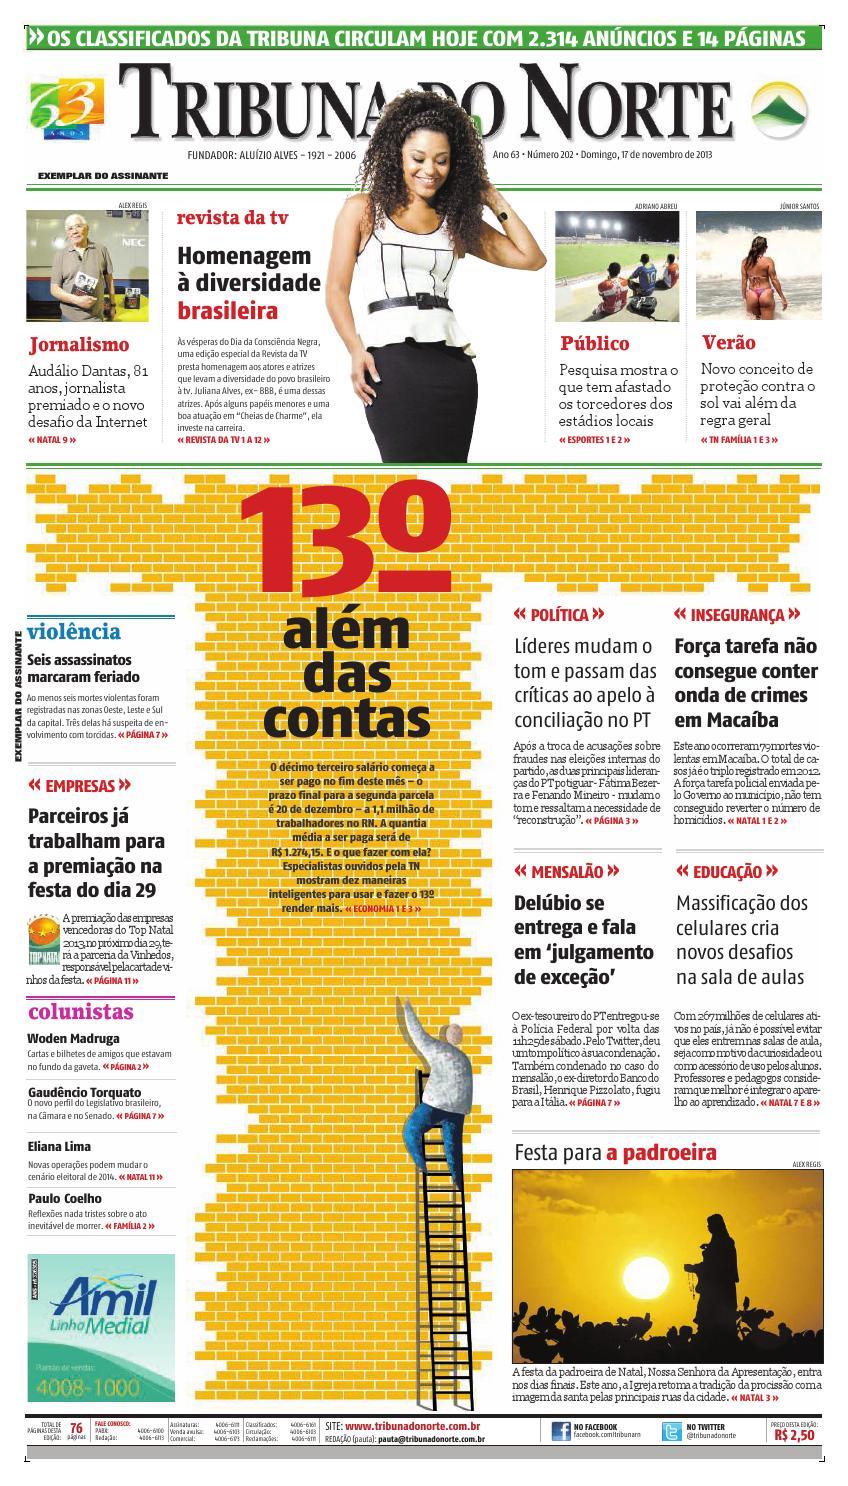 Tribuna do Norte - 17 11 2013 by Empresa Jornalística Tribuna do Norte Ltda  - issuu 76071bd0c8